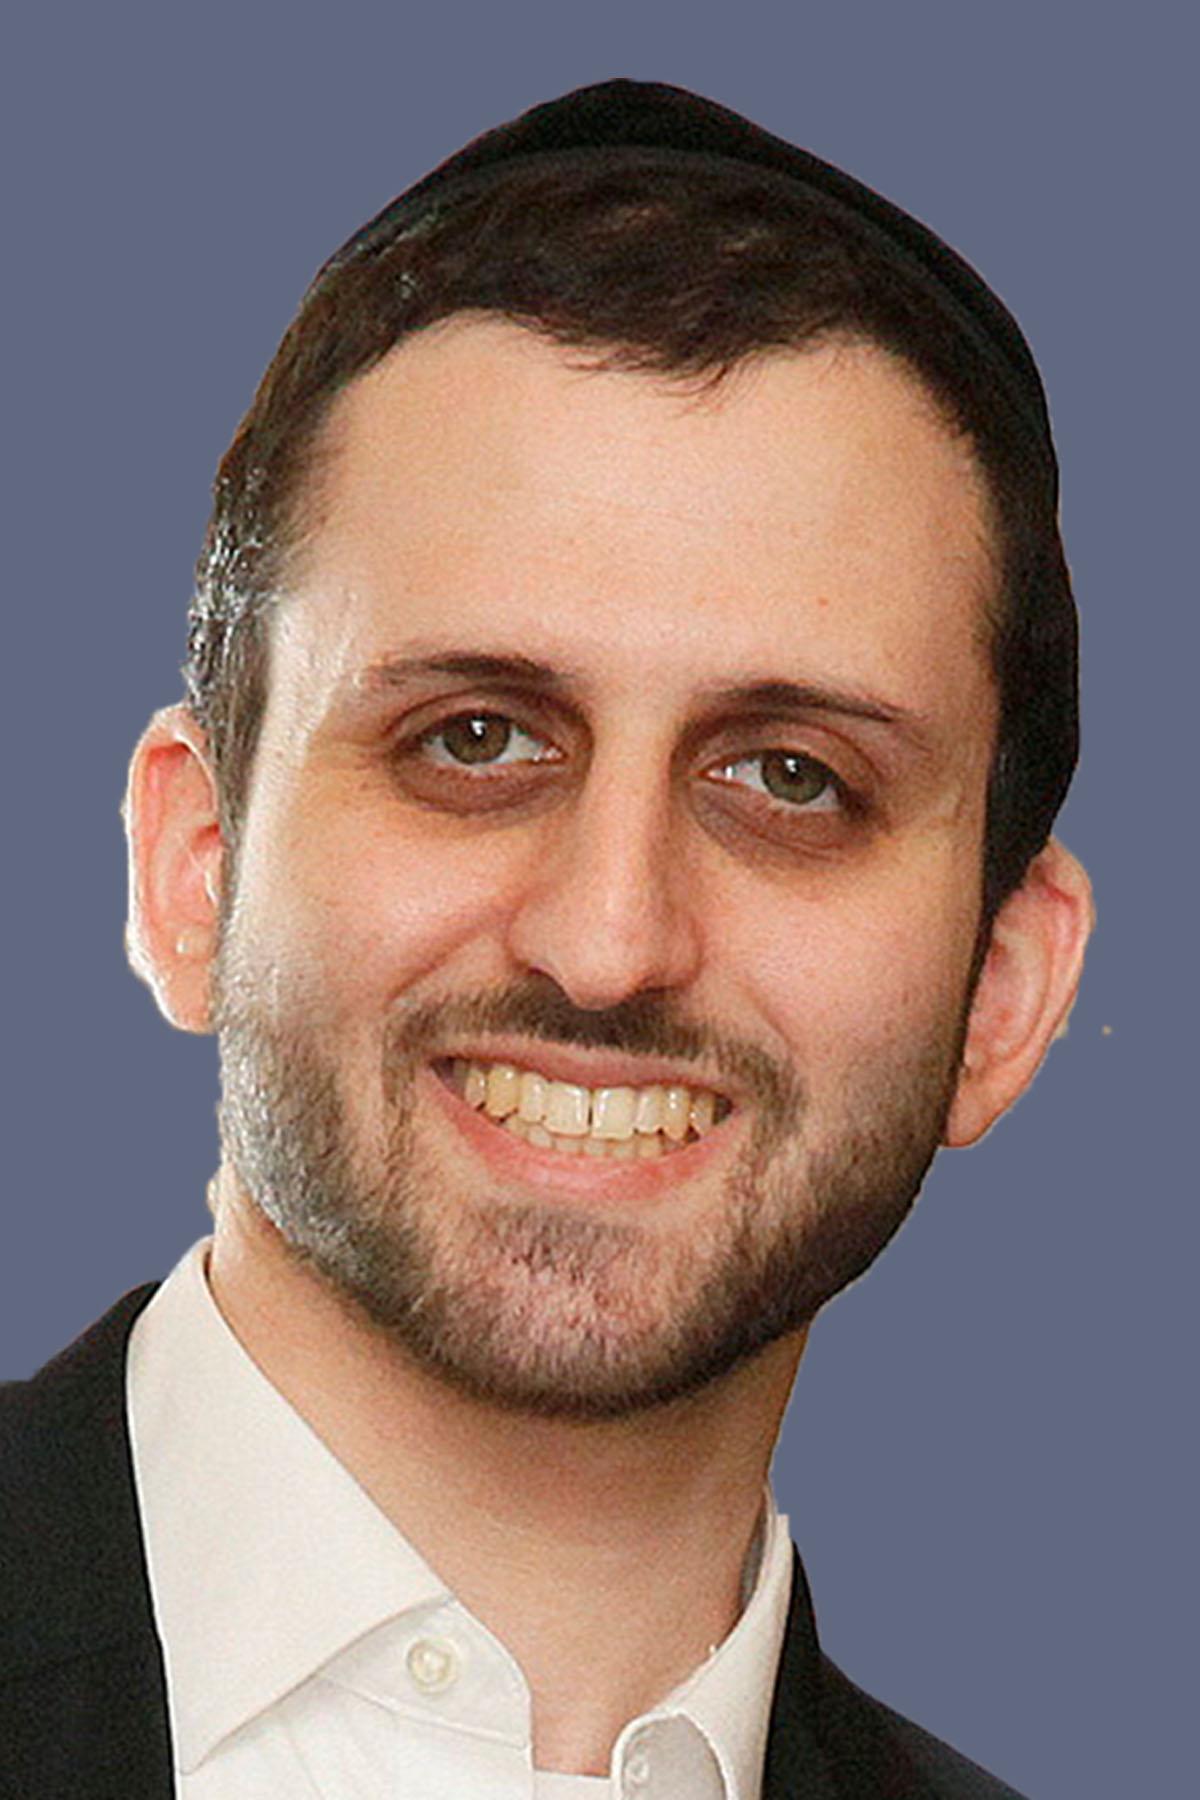 Rabbi Rafi Shenk